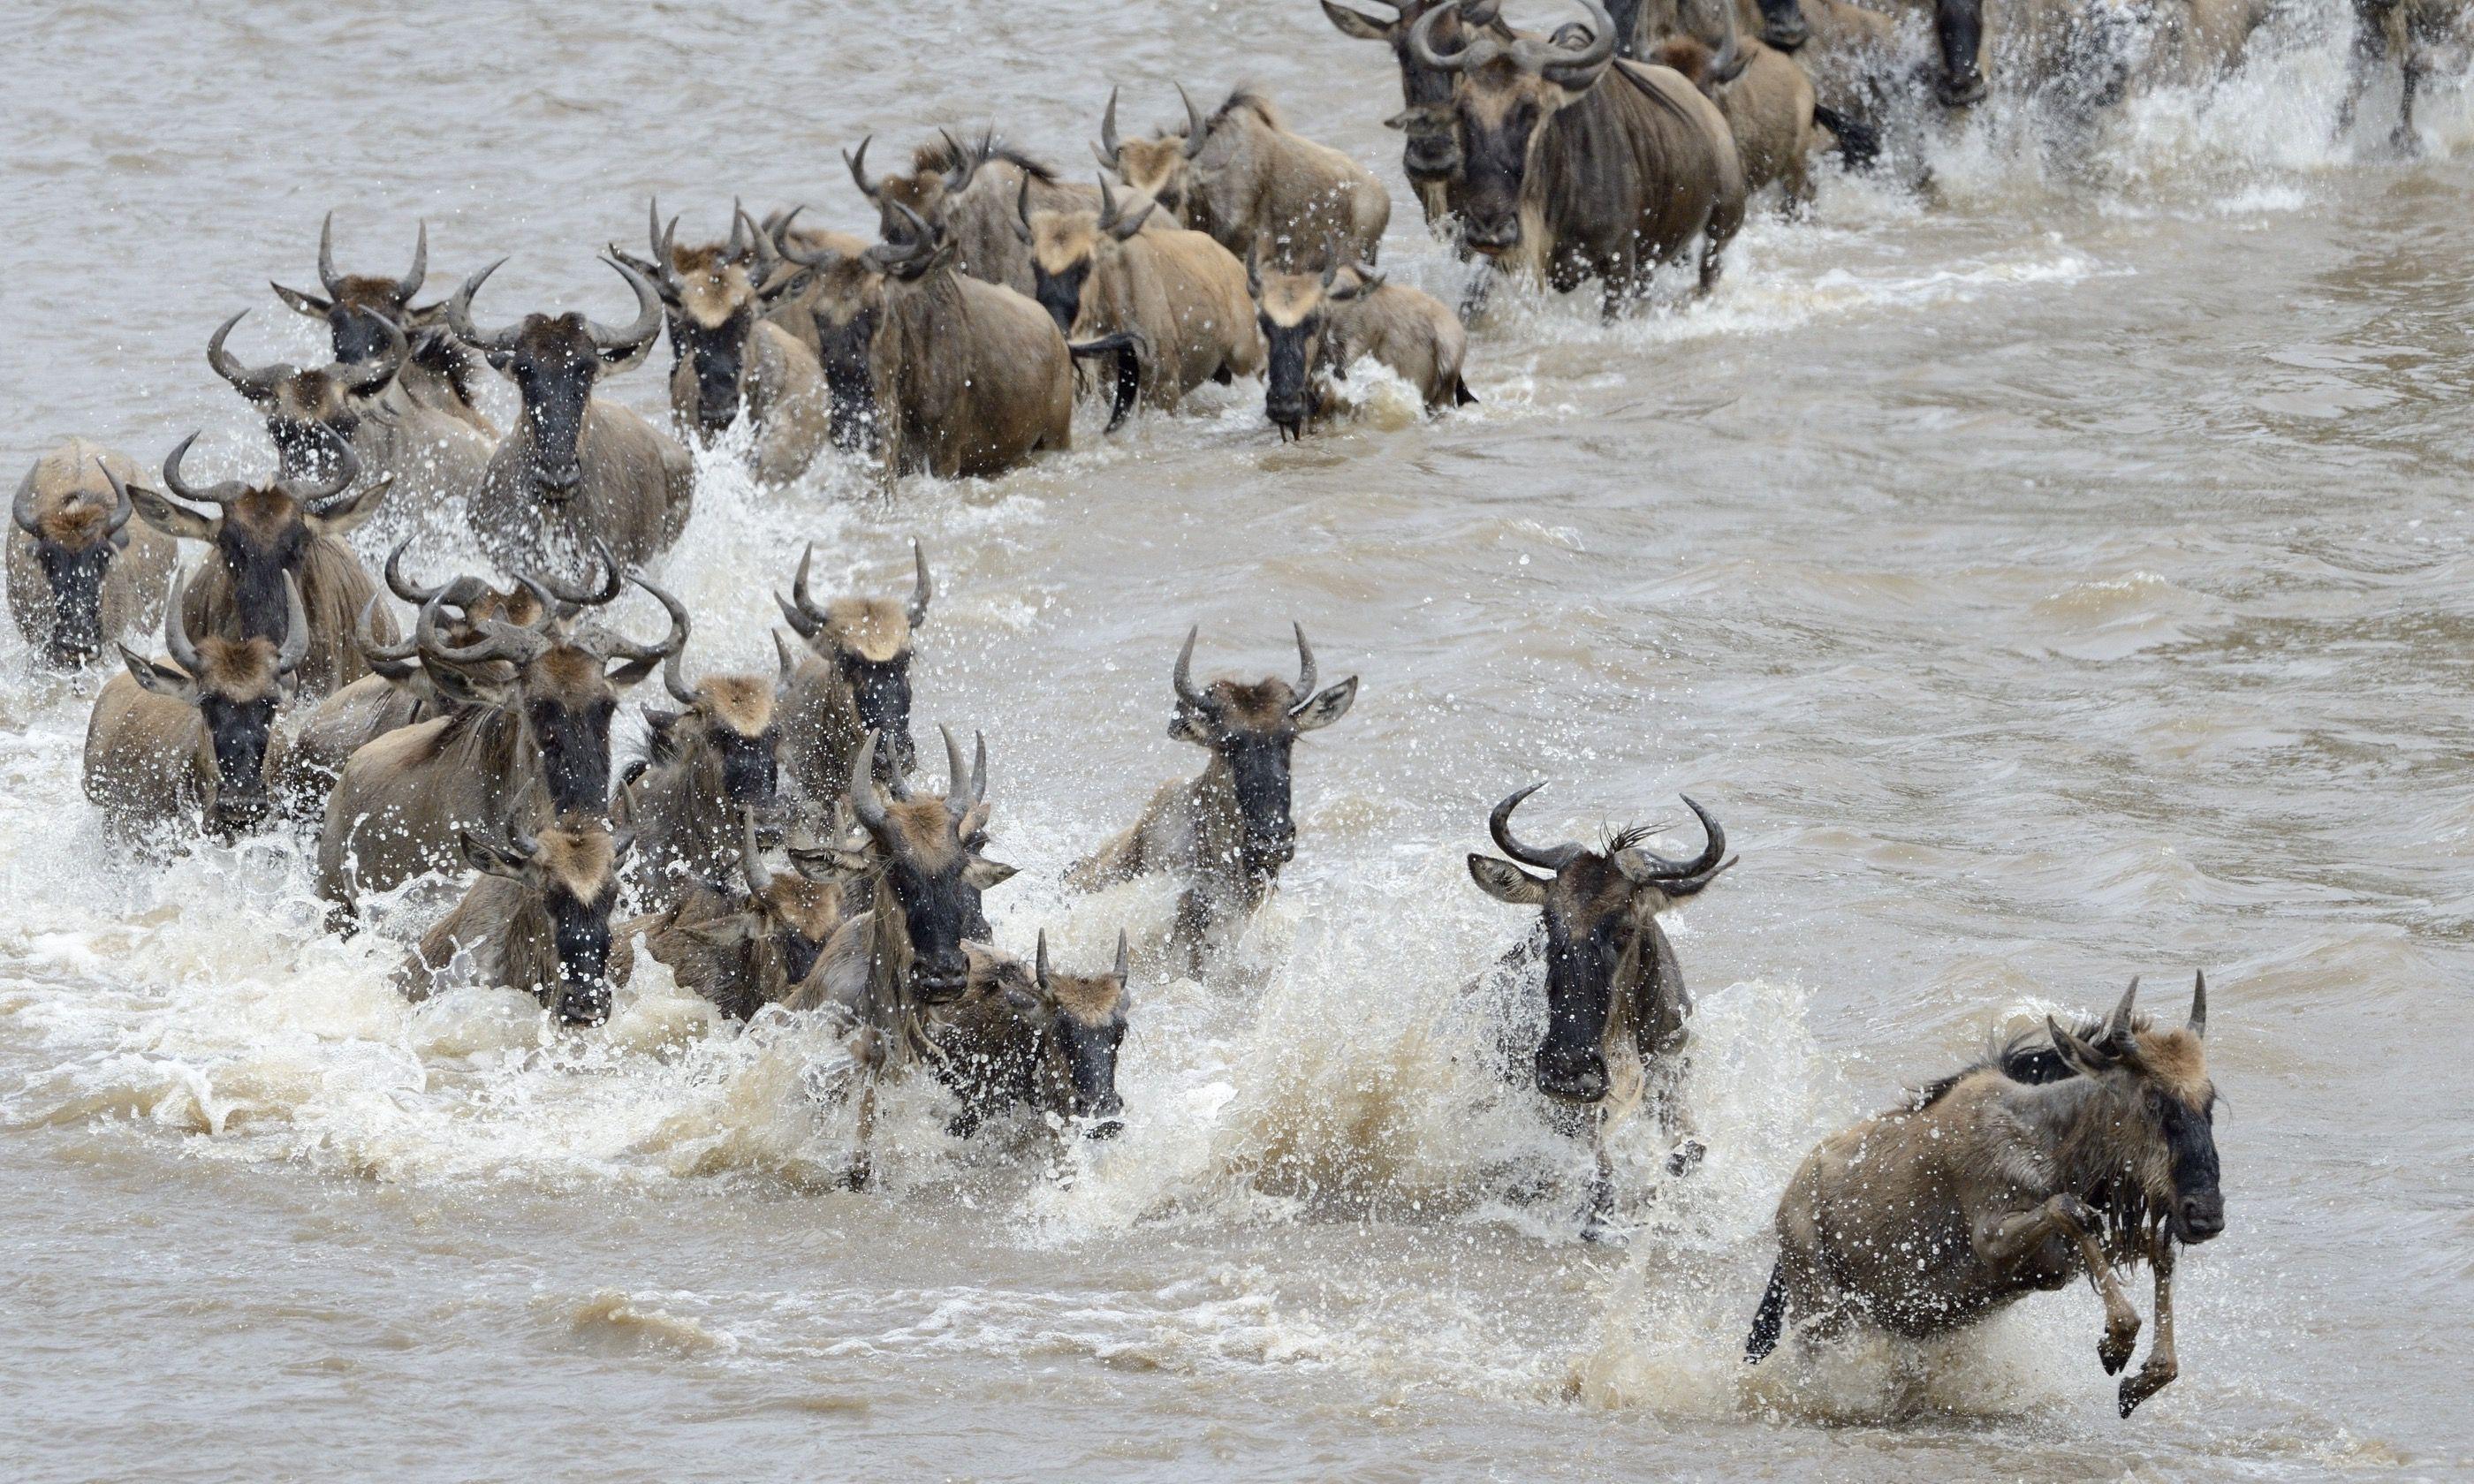 Wildebeest crossing the Mara River (Shutterstock.com)